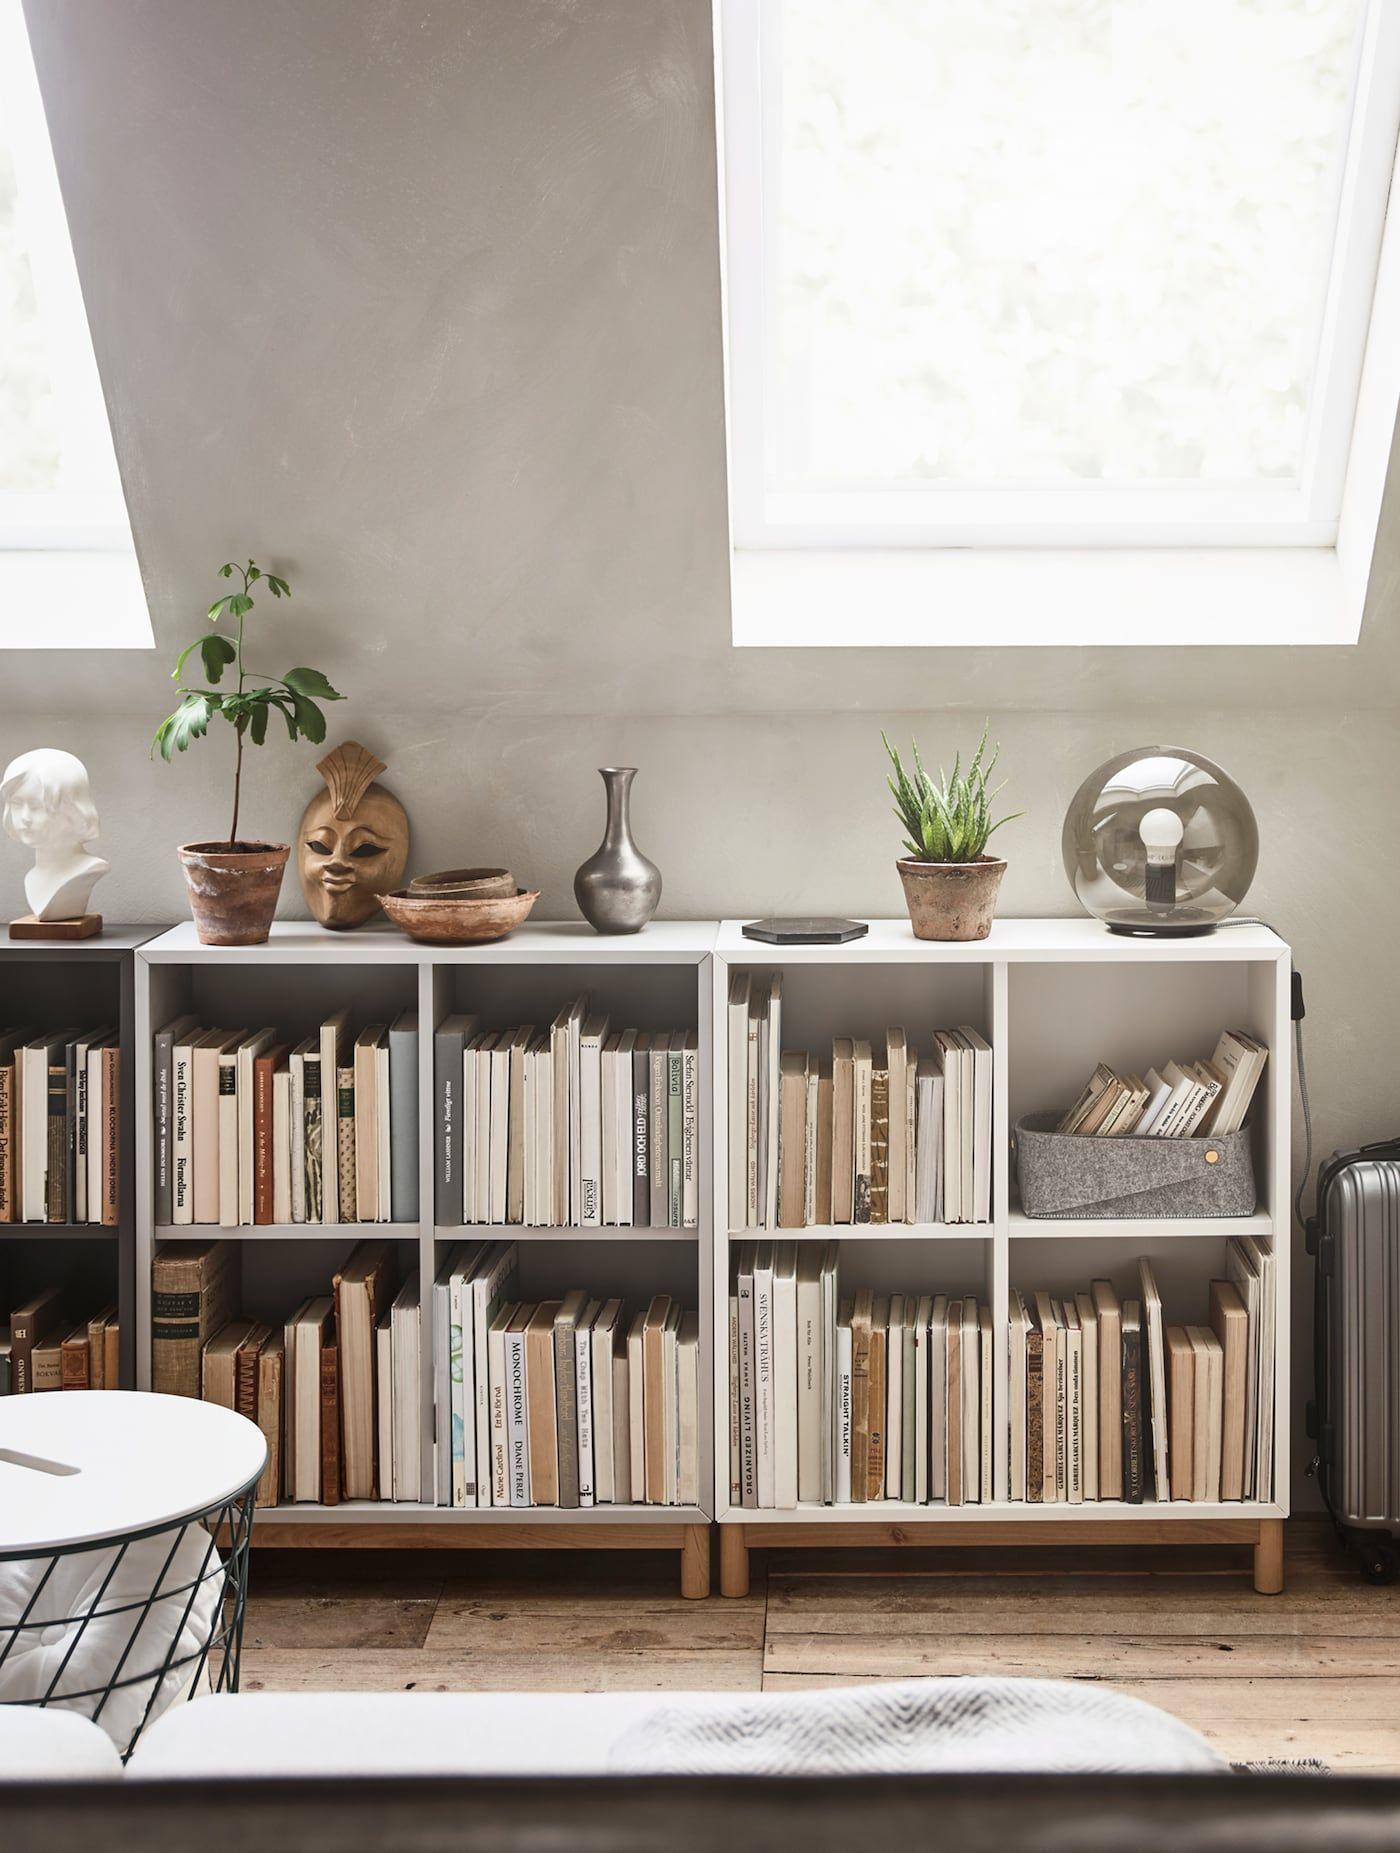 Gaste Arbeitszimmer Kombinieren Profi Tipps Arbeitszimmer Gaste Kombinieren Profitipps In 2020 Small Guest Rooms Guest Room Office Living Room Shelves